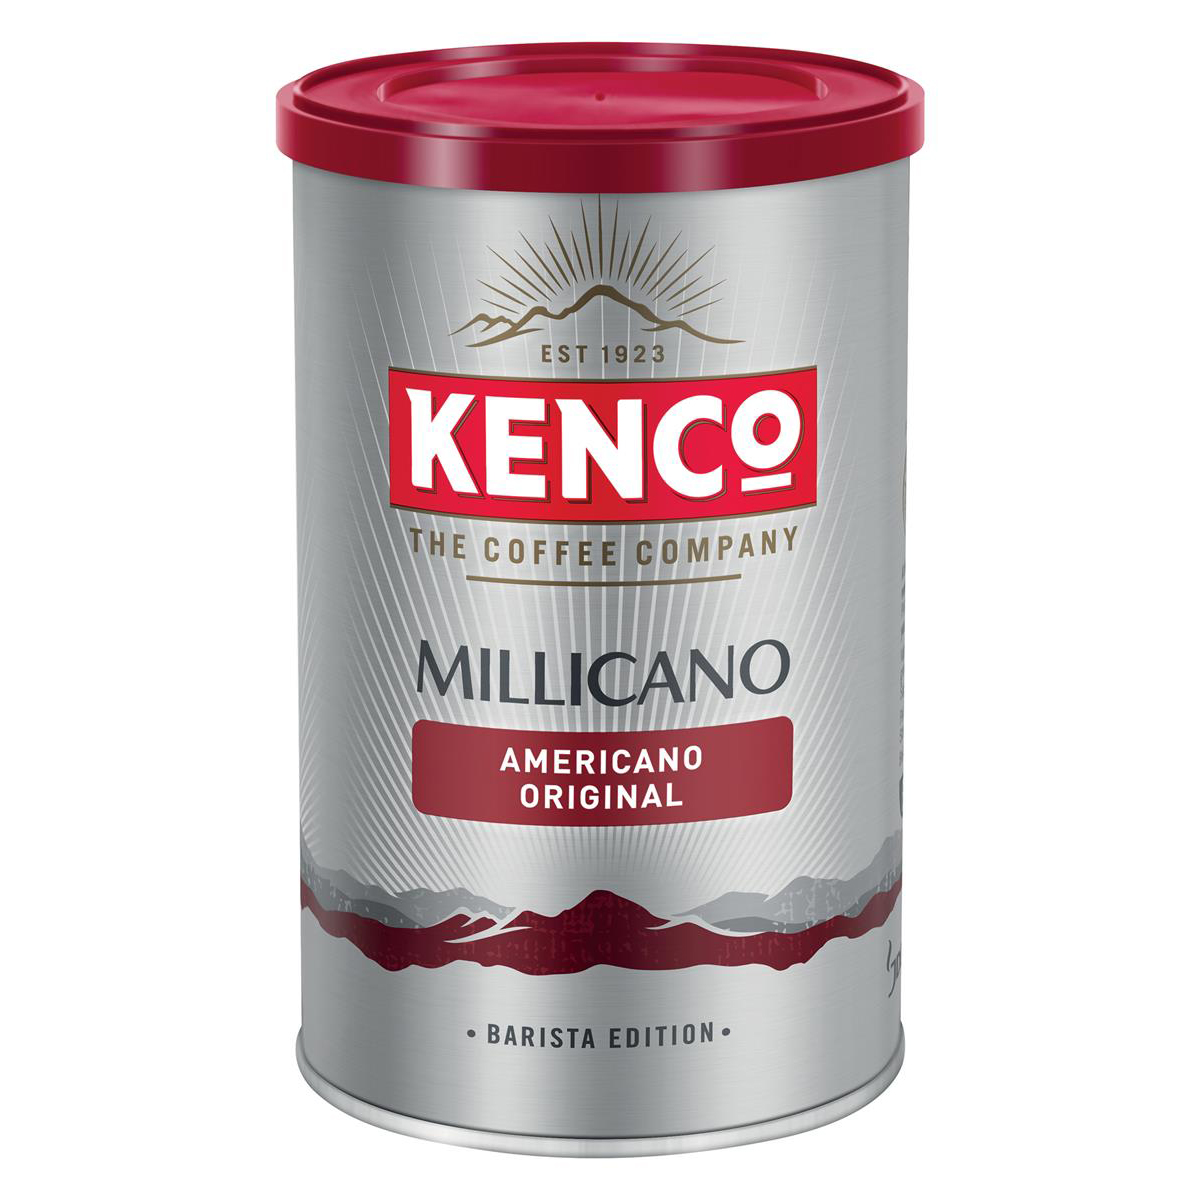 Kenco Millicano Americano Coffee Wholebean Instant Original 100g Ref 4032092